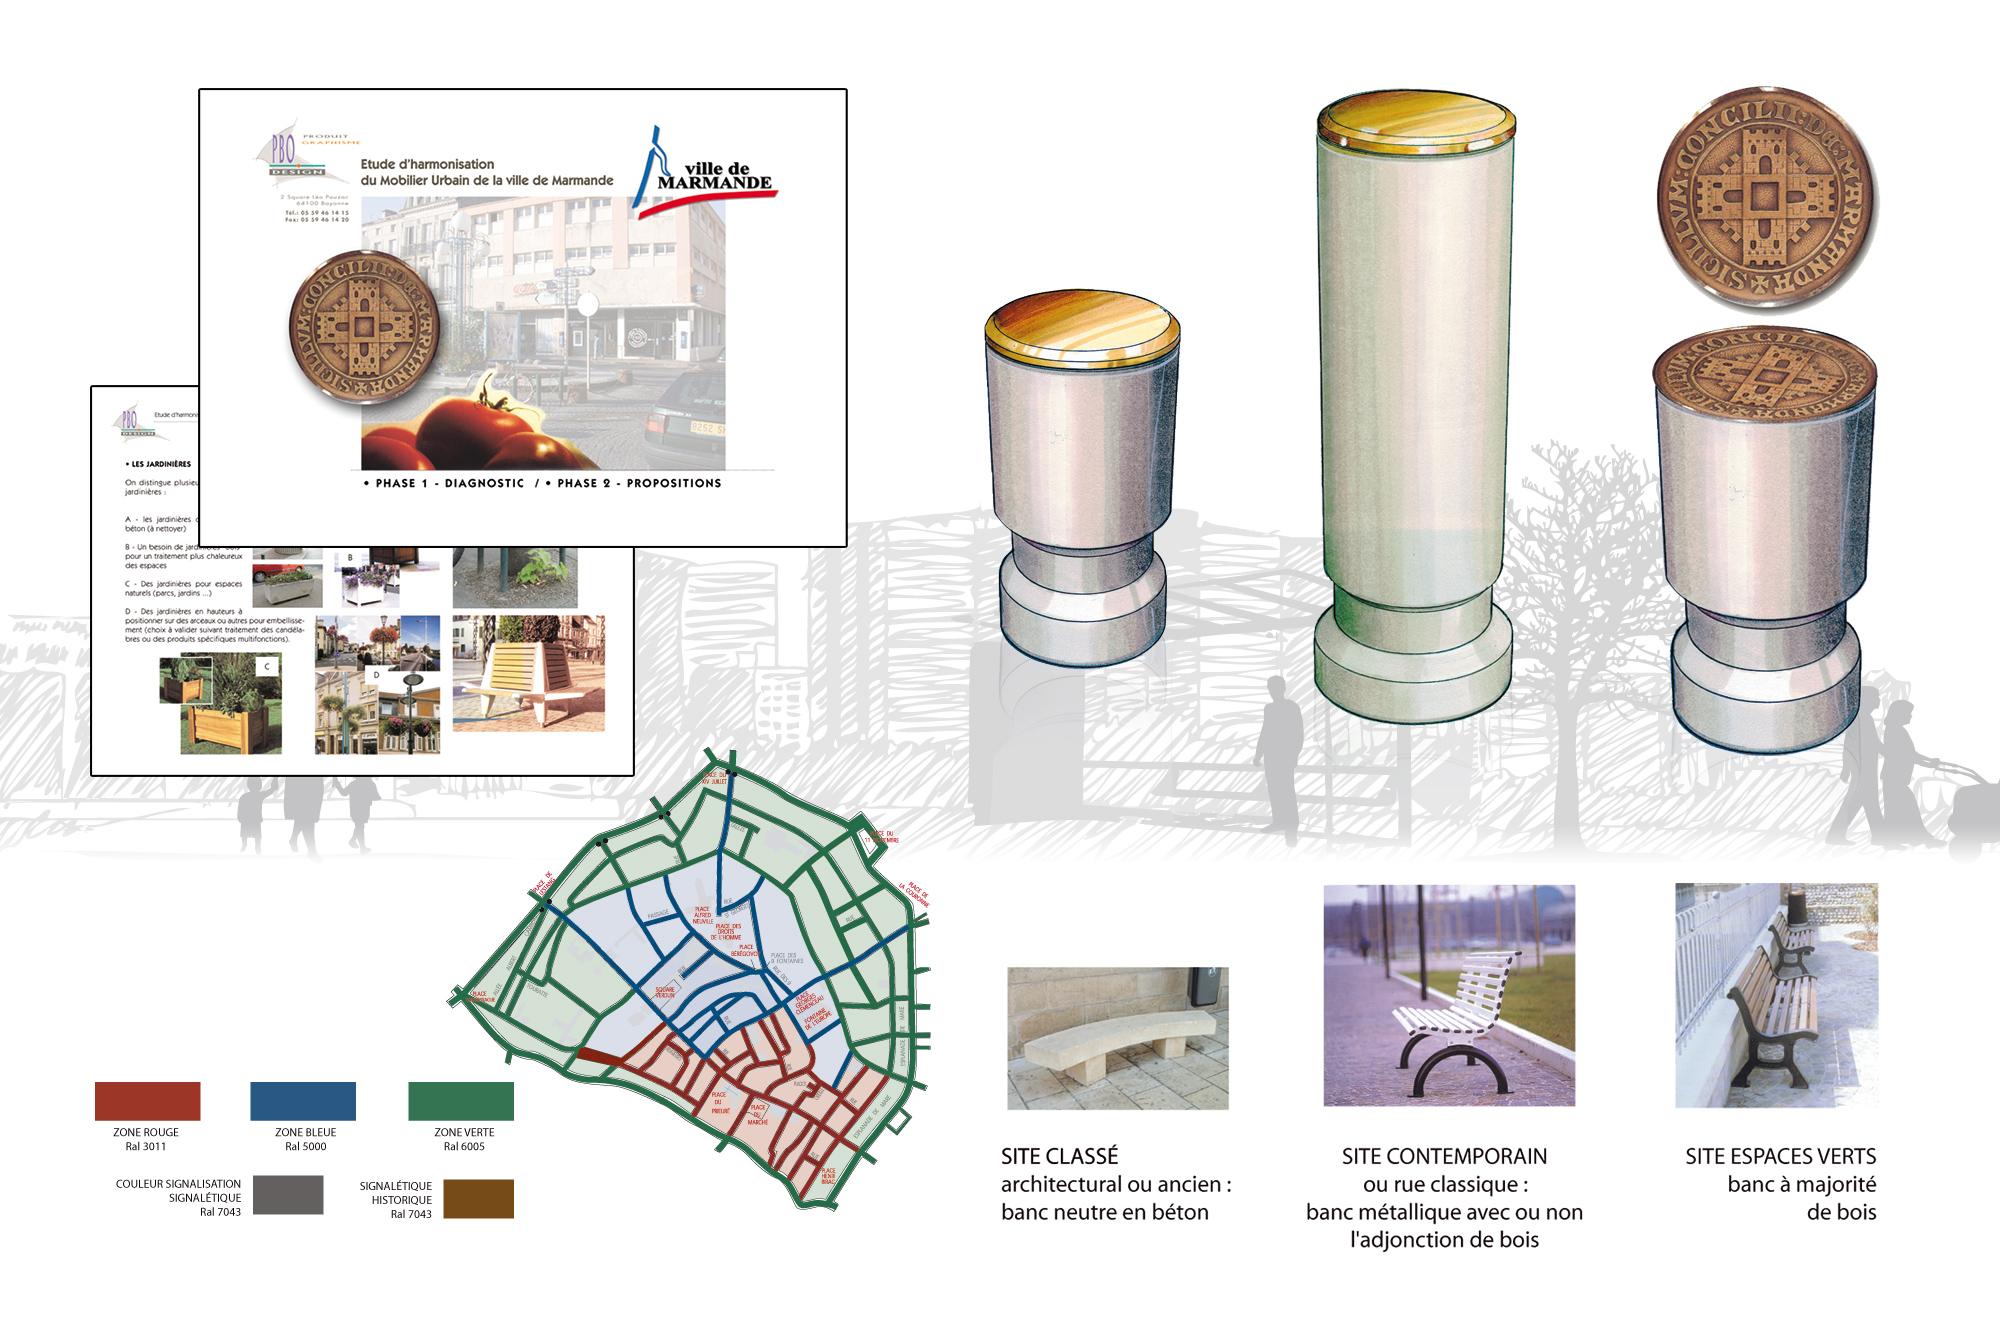 Etude d'harmonisation du mobilier urbain de Marmande 2